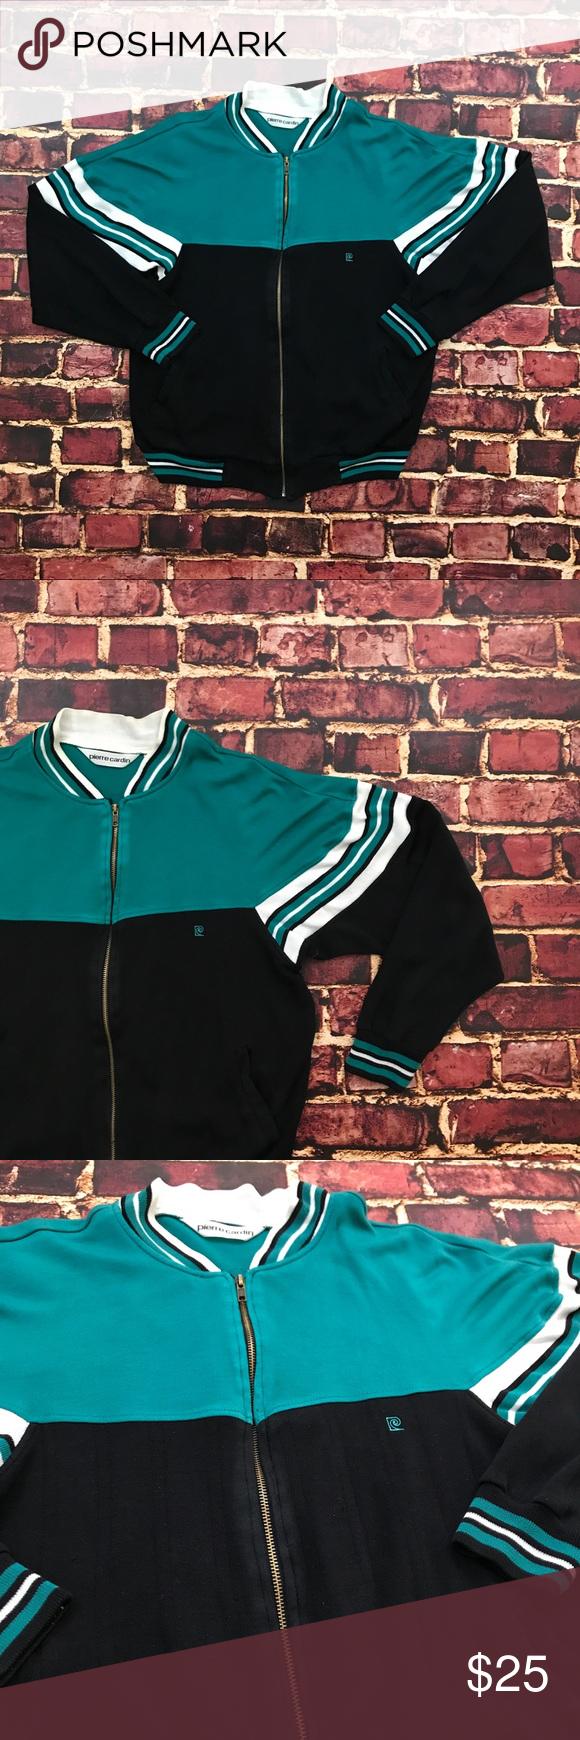 Vintage Track Jacket Colorblock Striped 80s 90s Vintage Pierre Cardin Color Block Full Zip Track Jacket Mens Medium Black Track Jackets Vintage Jacket Jackets